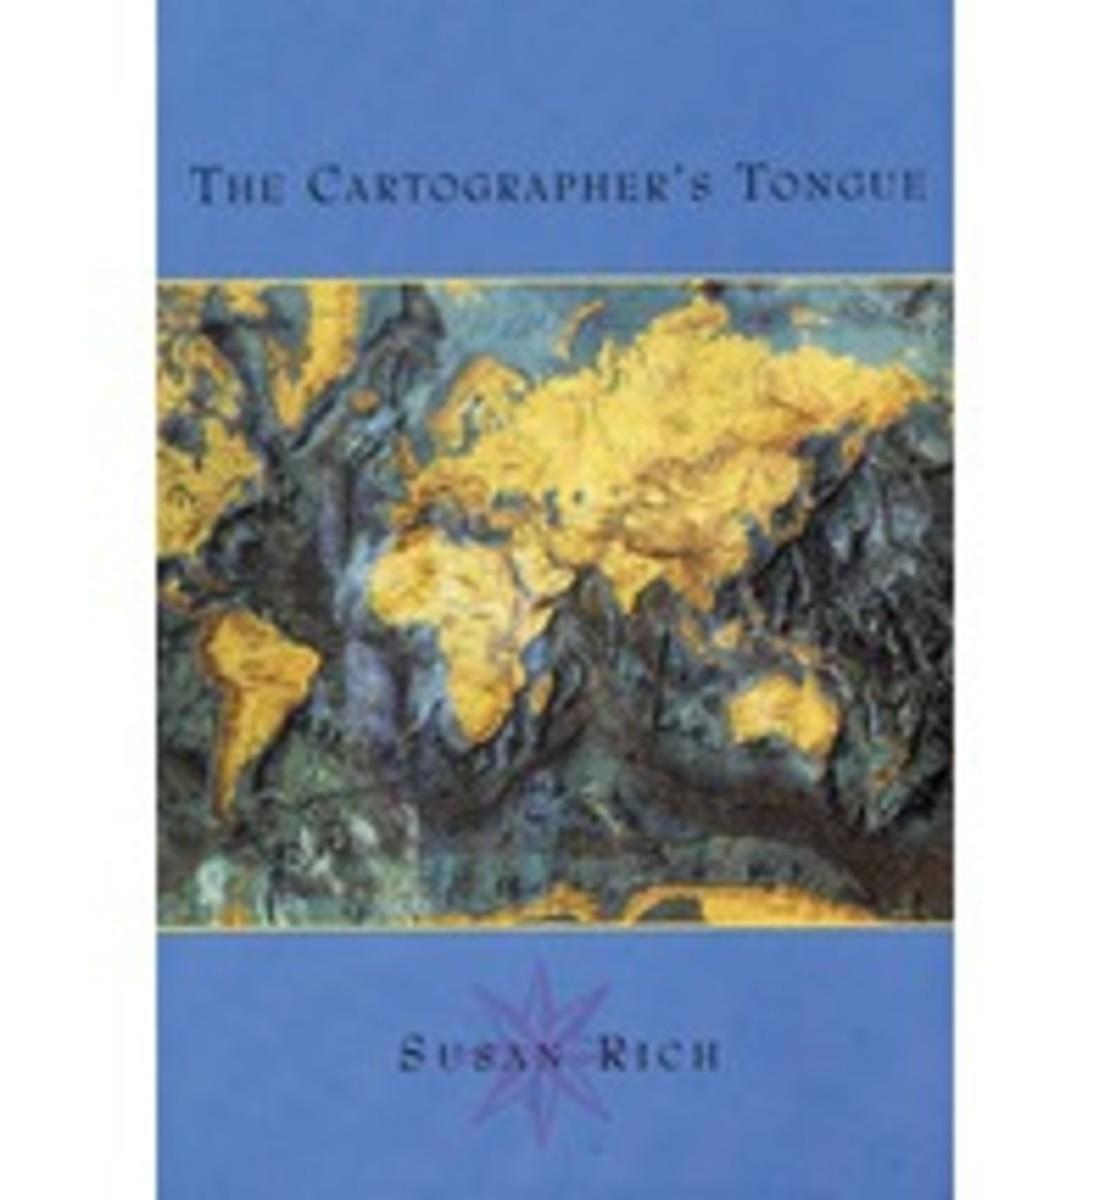 the_cartographers_tongue_susan_rich